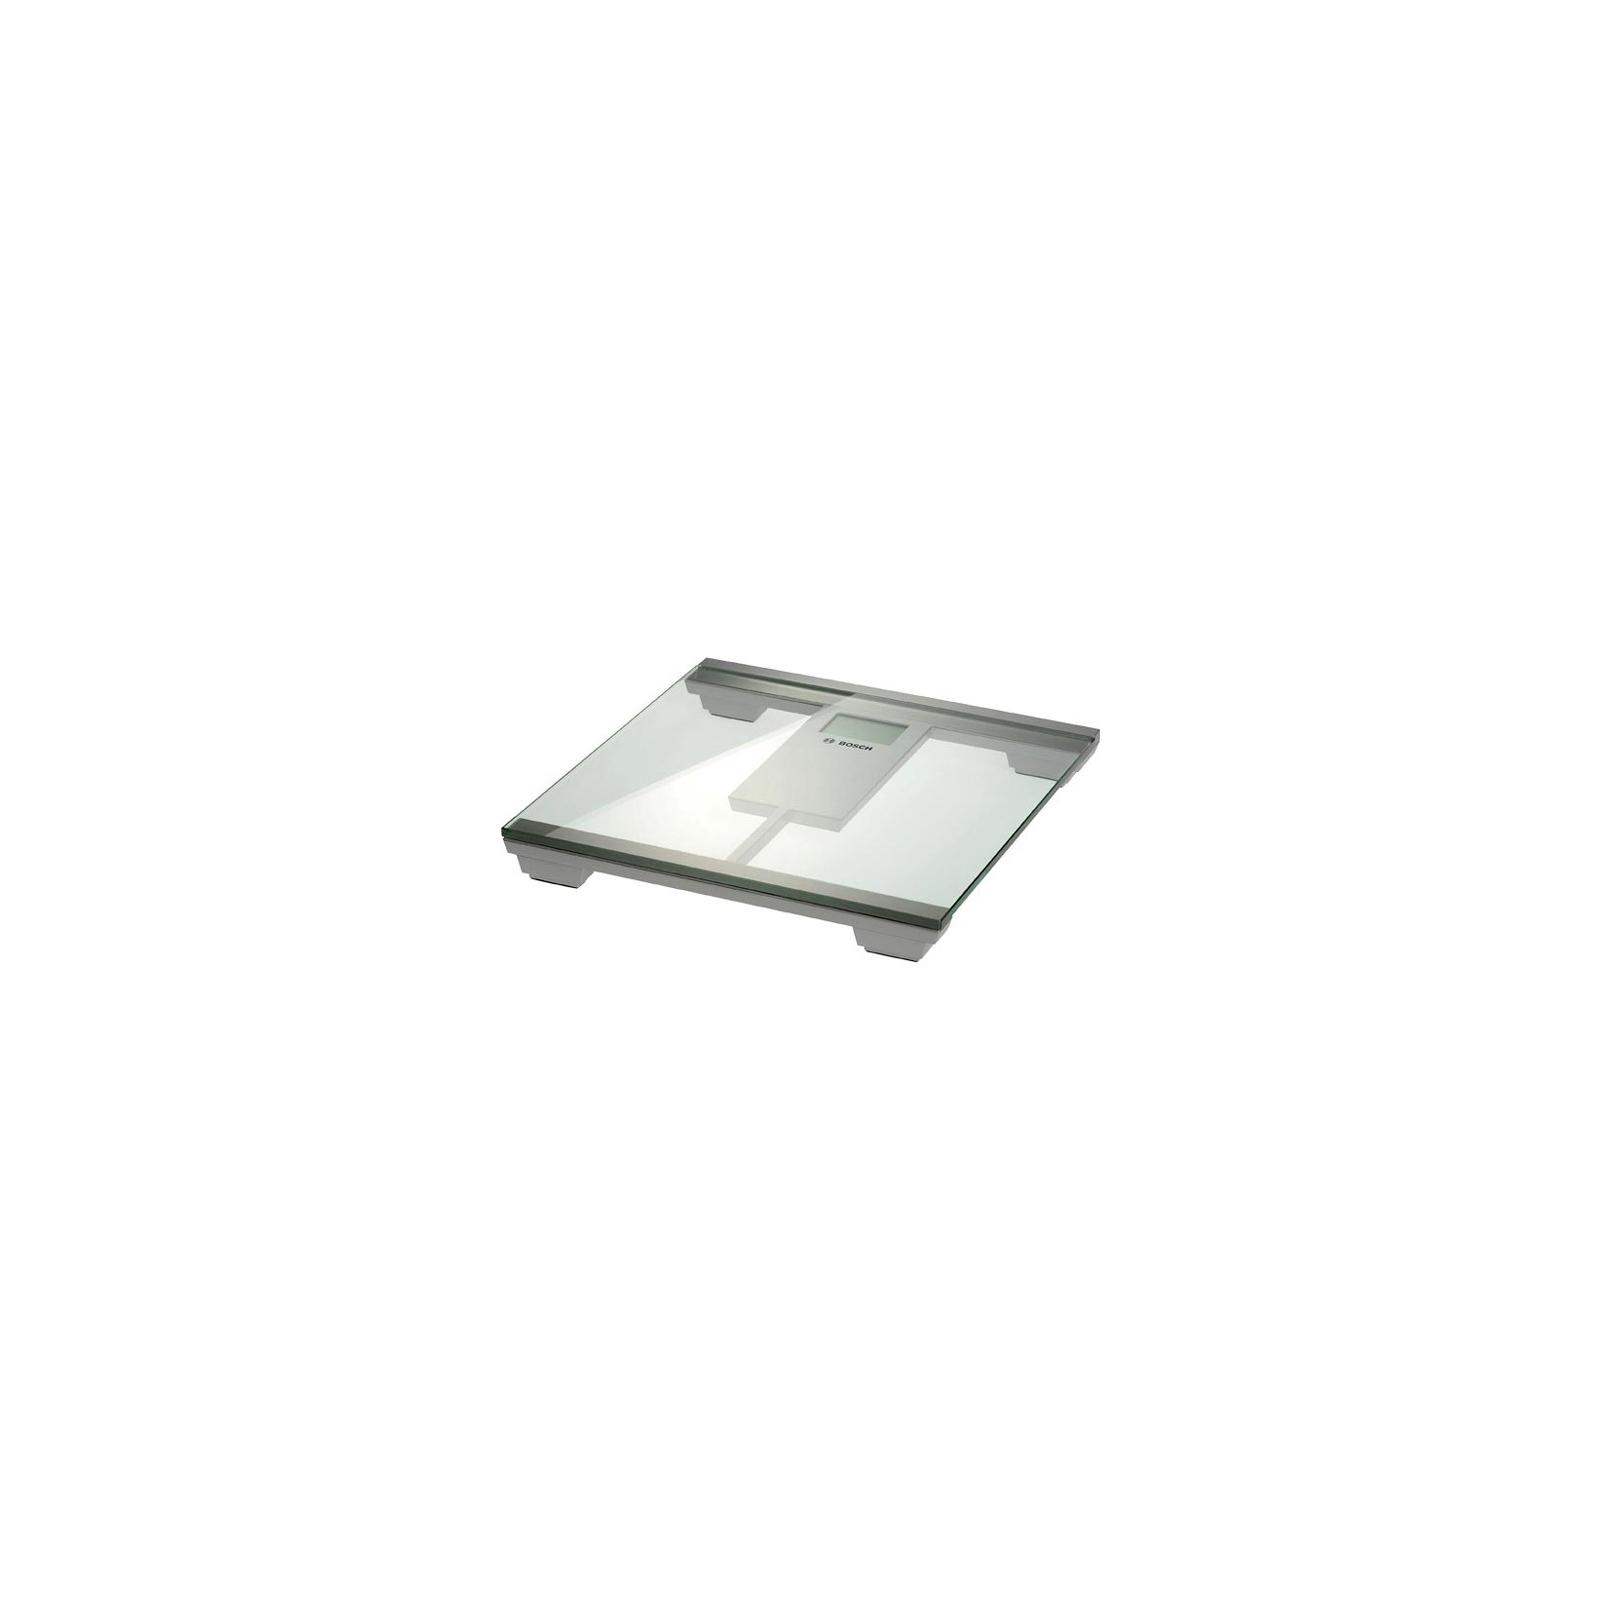 Весы напольные BOSCH PPW4200